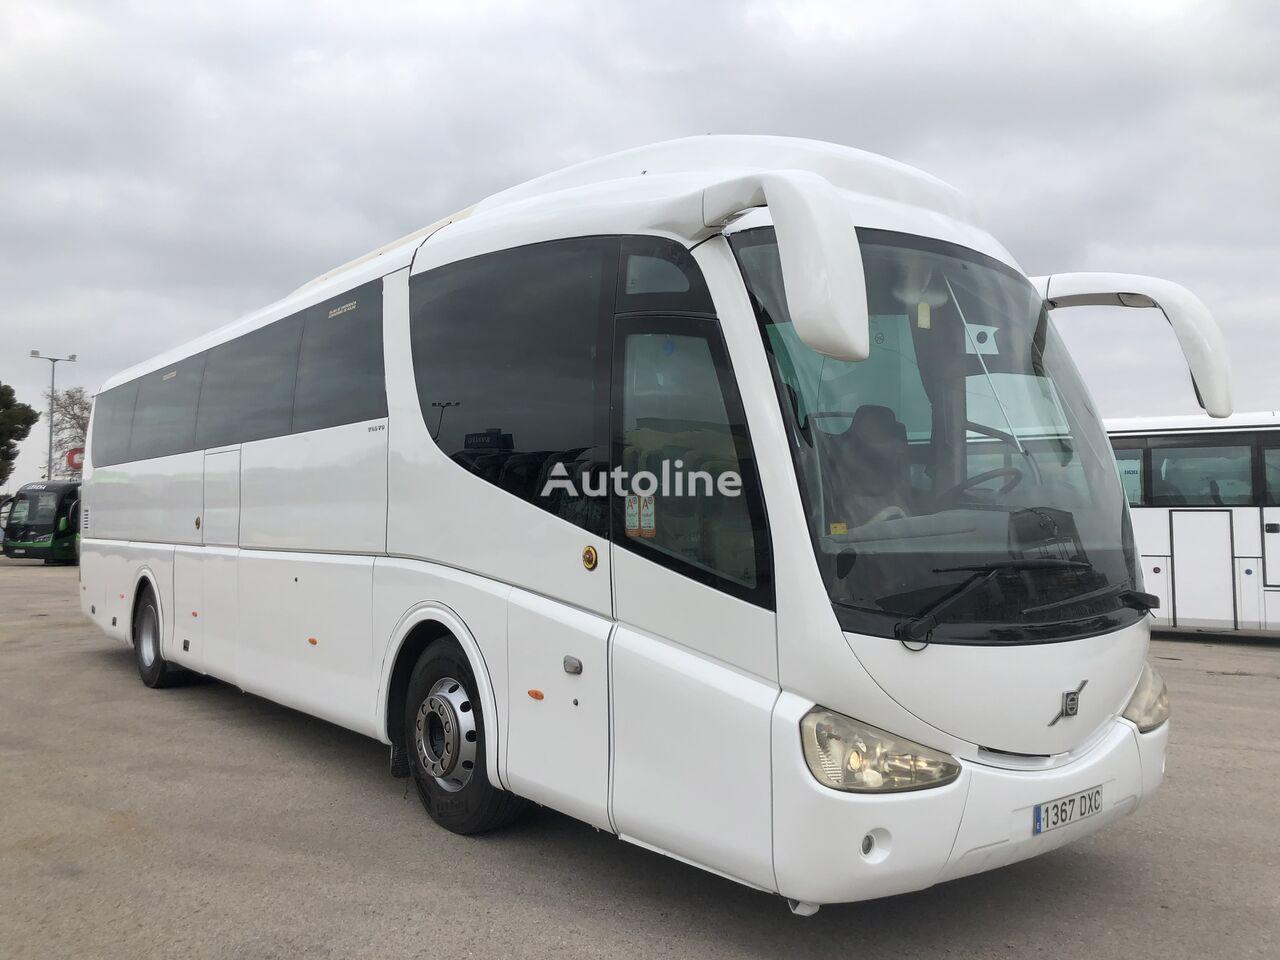 VOLVO B12B IRIZAR PB (55+1+1) coach bus